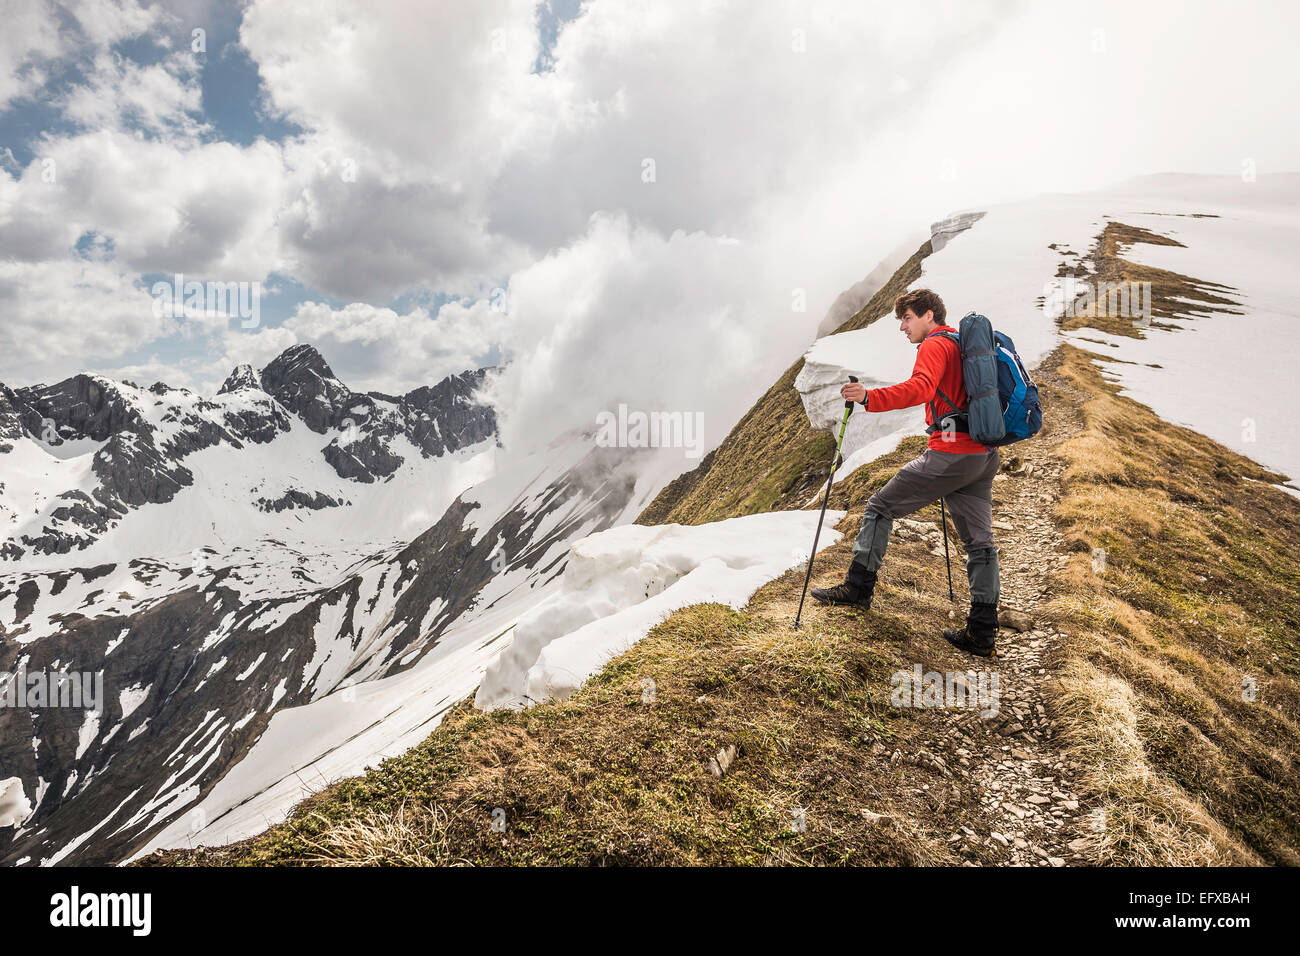 Giovane maschio trekker montagna cercando di ridge nelle Alpi Bavaresi, Oberstdorf, Baviera, Germania Immagini Stock